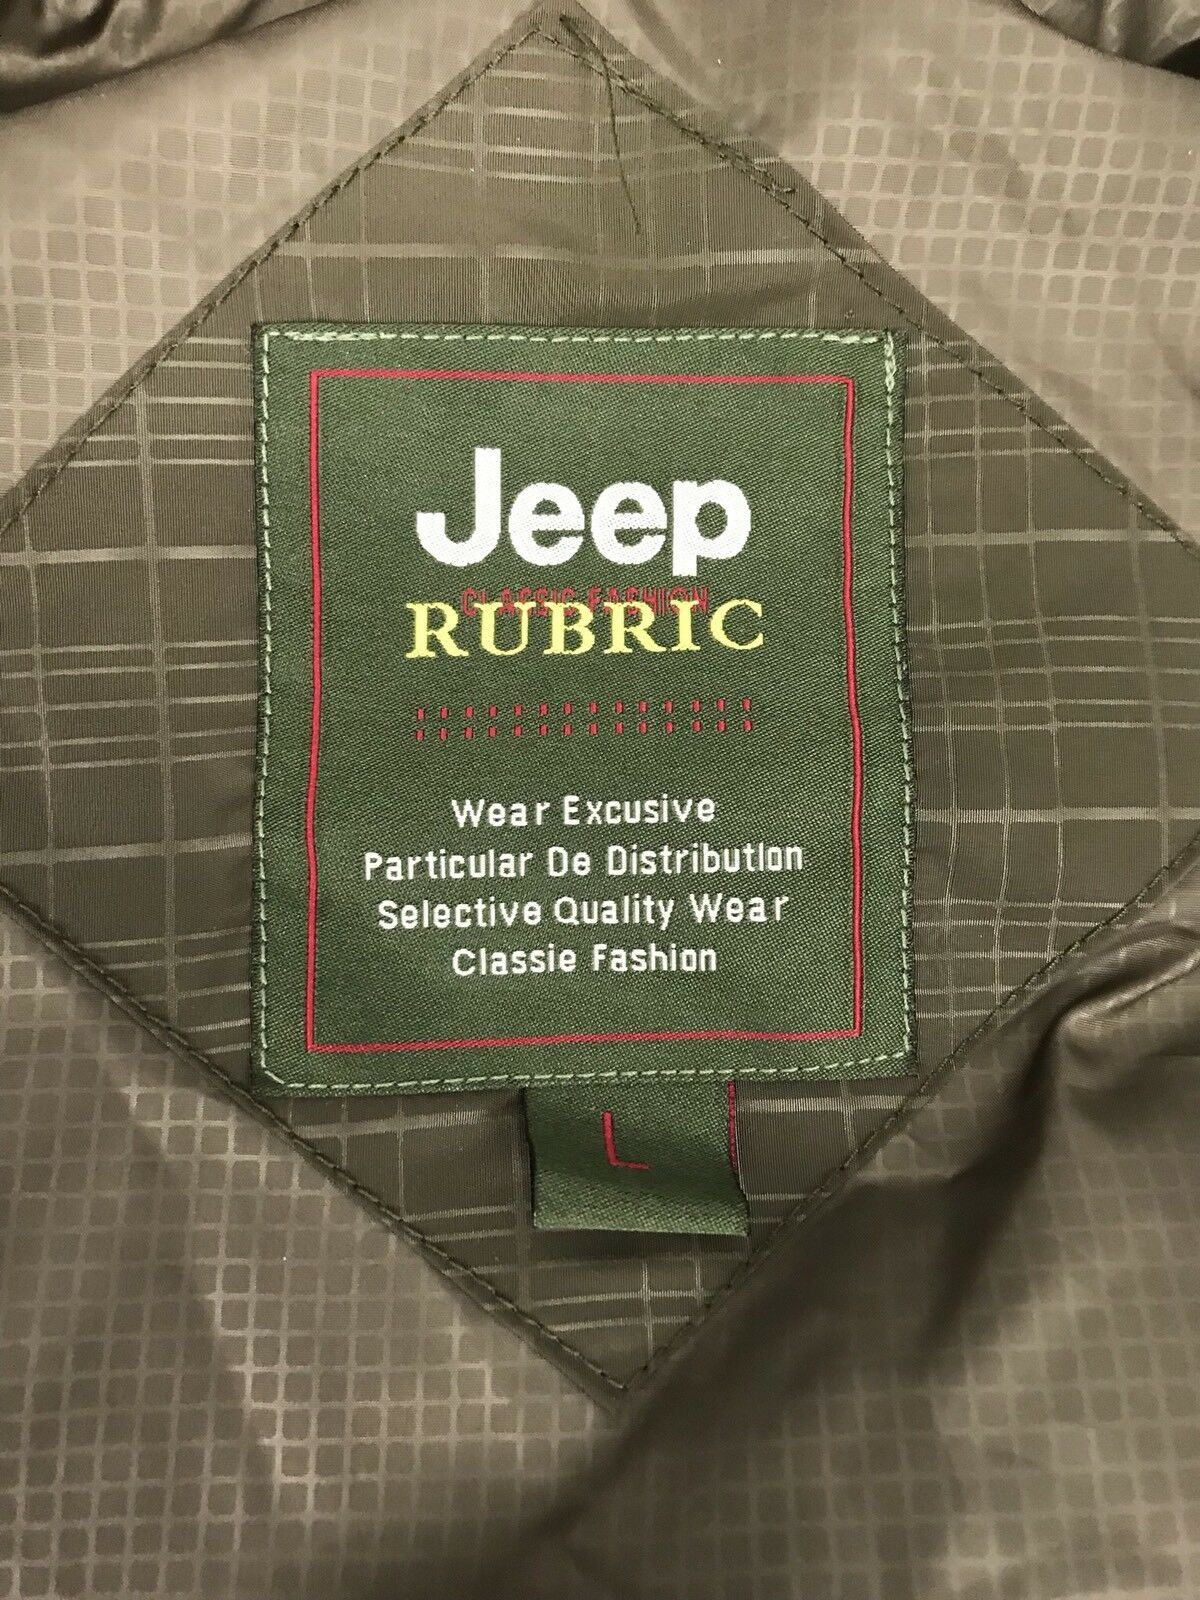 Jeep Down Vest Rubric Estab Estab Estab 2011 Ralph Lauren Brown Full Zip Puffy Women's Large d4da0b